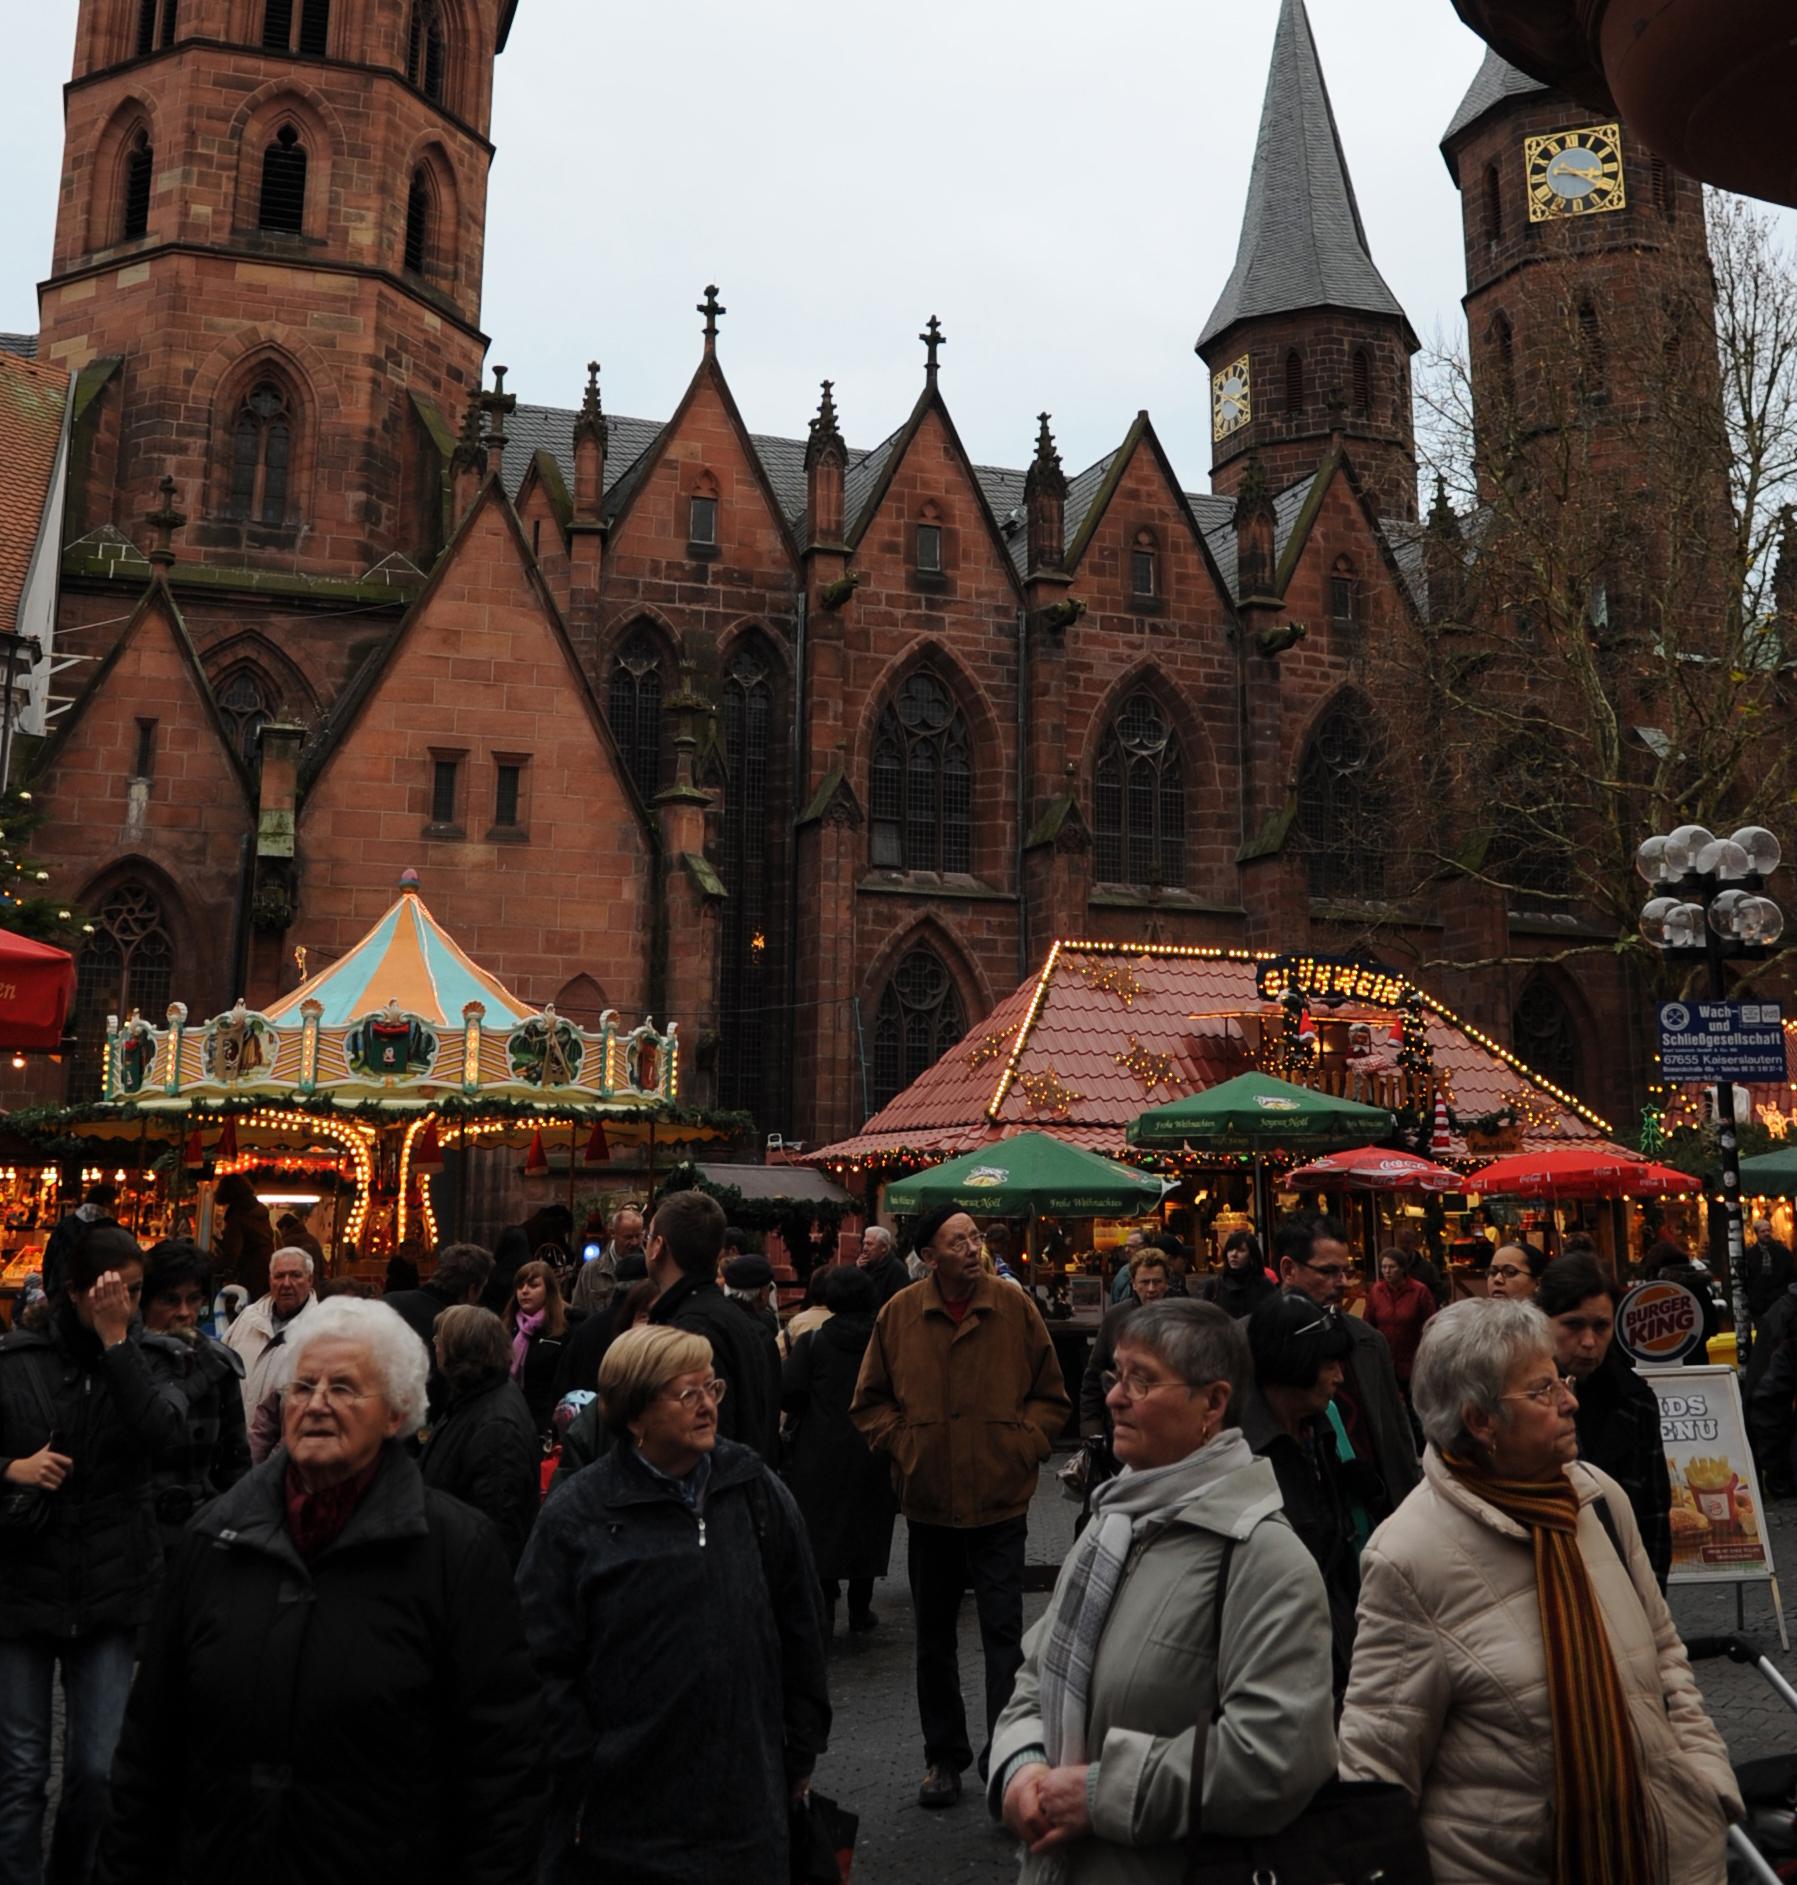 File:Christmas Market Kaiserslautern 2009 Evangelische ...